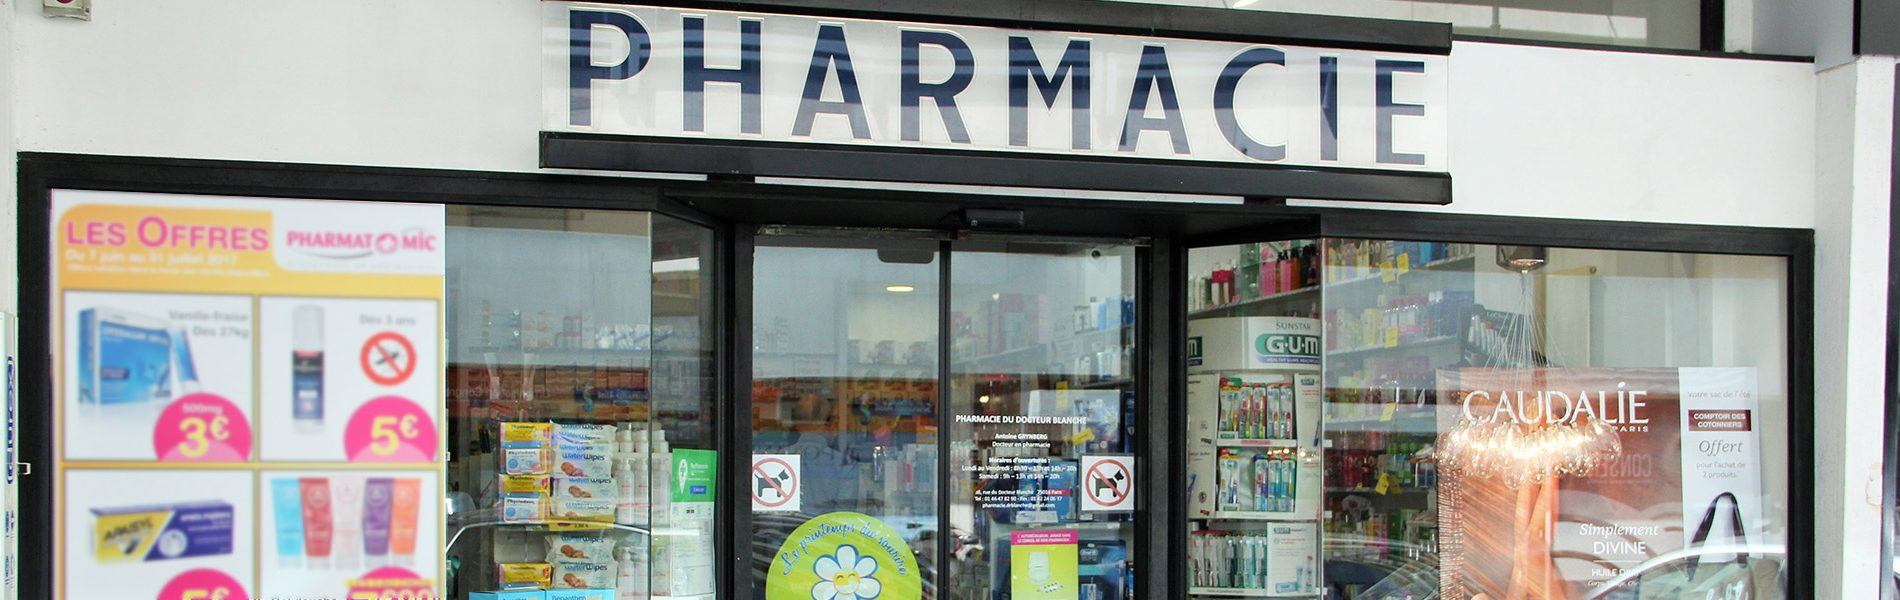 Pharmacie DU DOCTEUR BLANCHE - Image Homepage 2